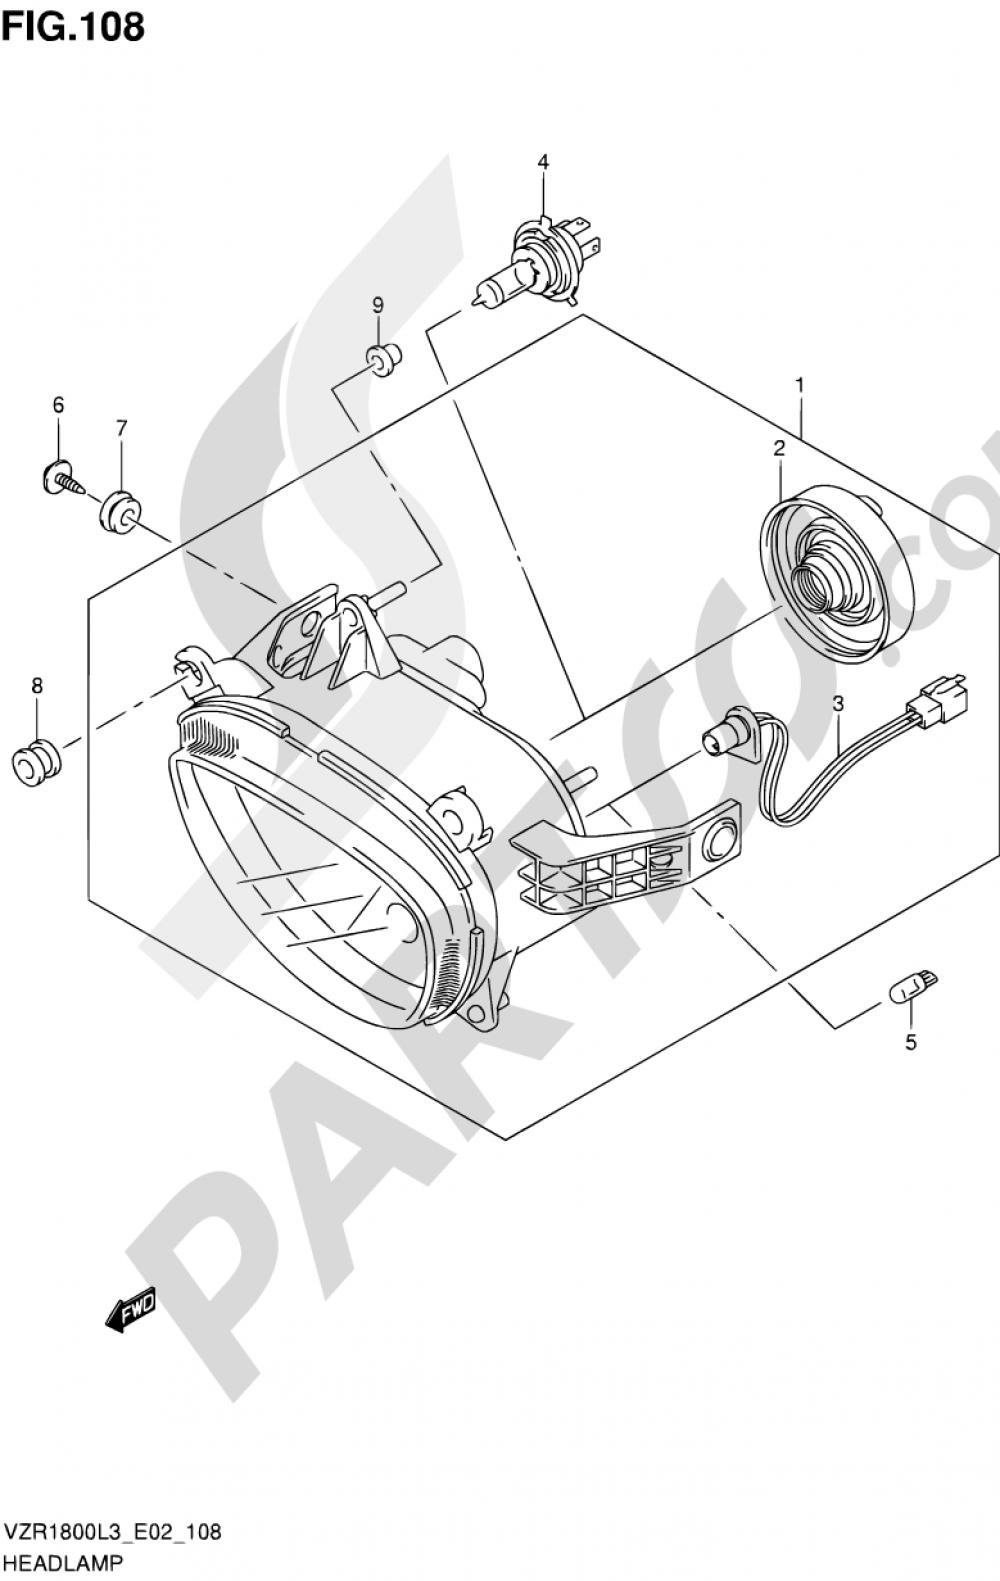 108 - HEADLAMP (VZR1800ZL3 E24) Suzuki VZR1800 2013